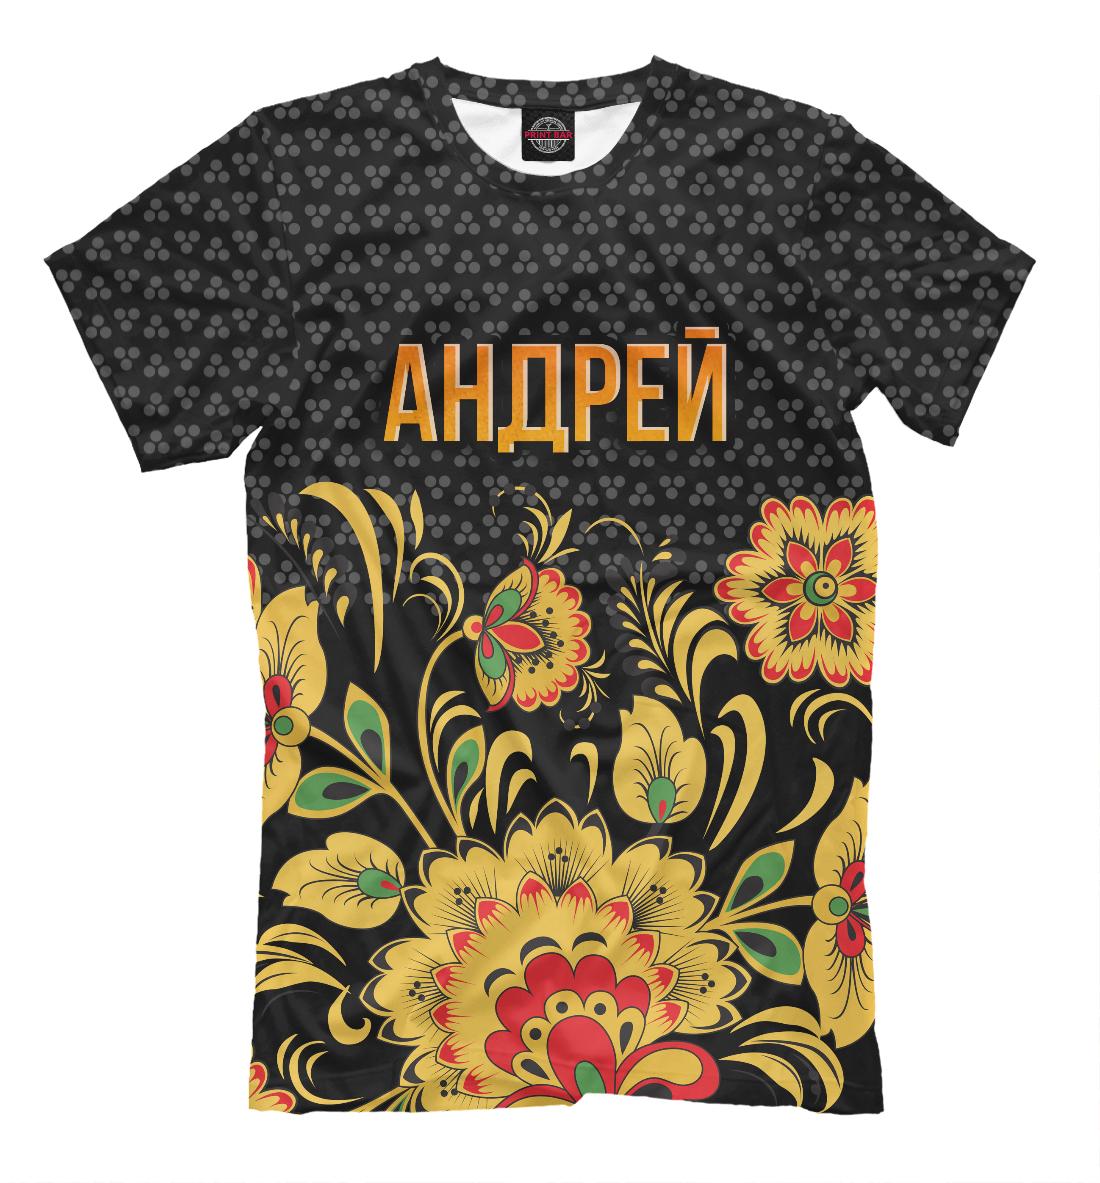 Купить Хохлома Андрей, Printbar, Футболки, AND-458246-fut-2